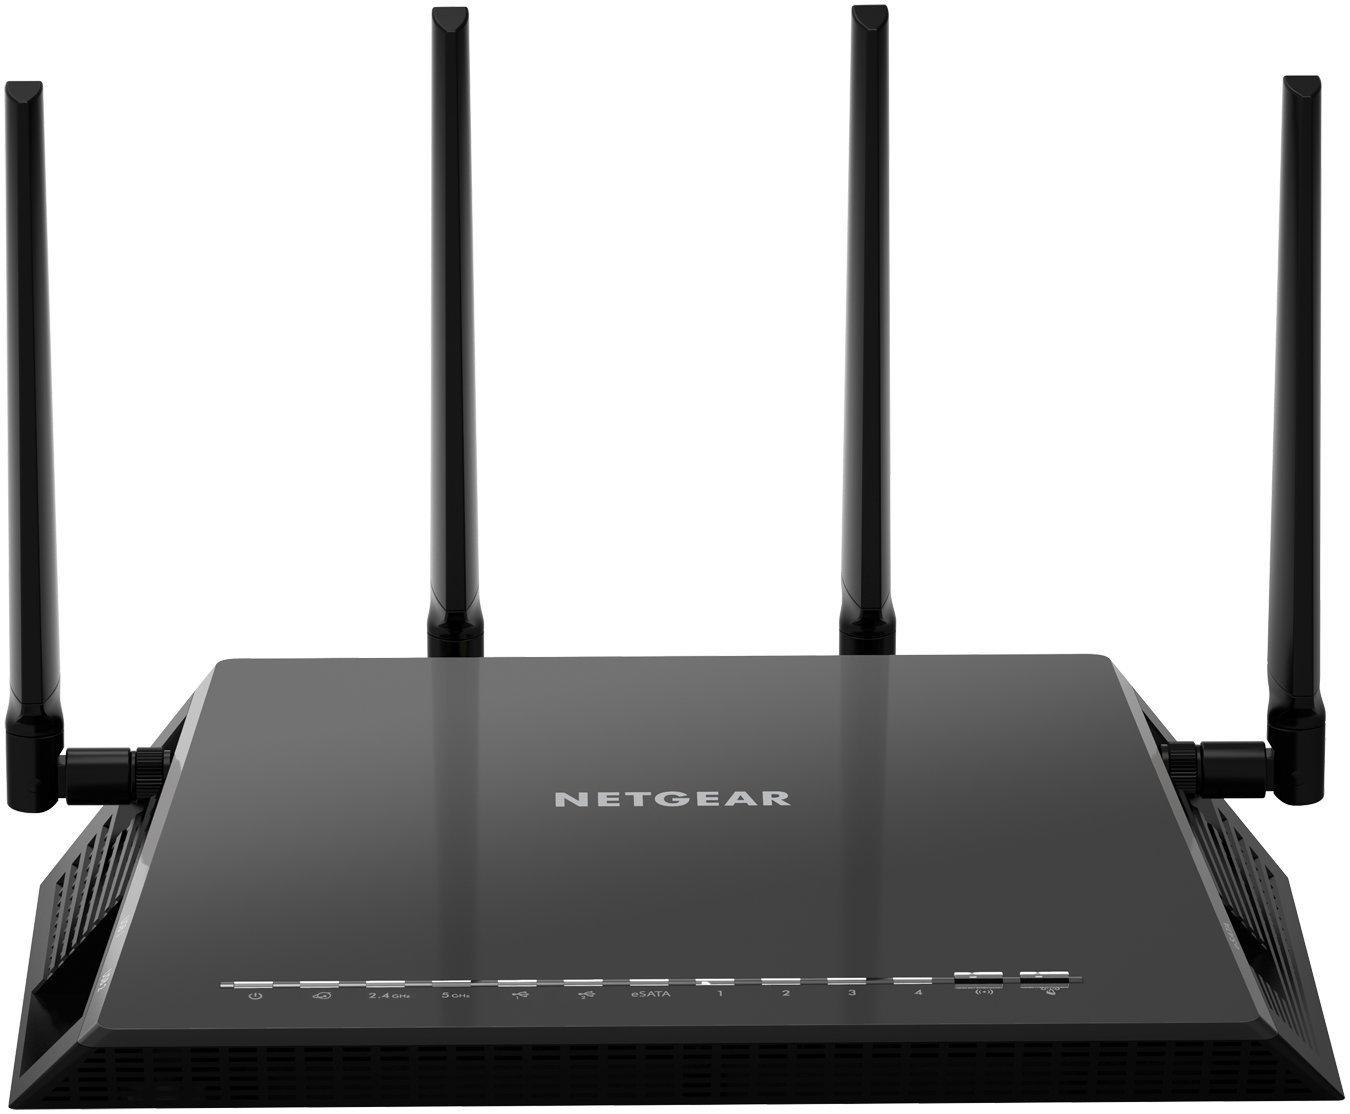 Netgear Nighthawk X4 AC2350 Dual-Band WiFi Gigabit Router ...